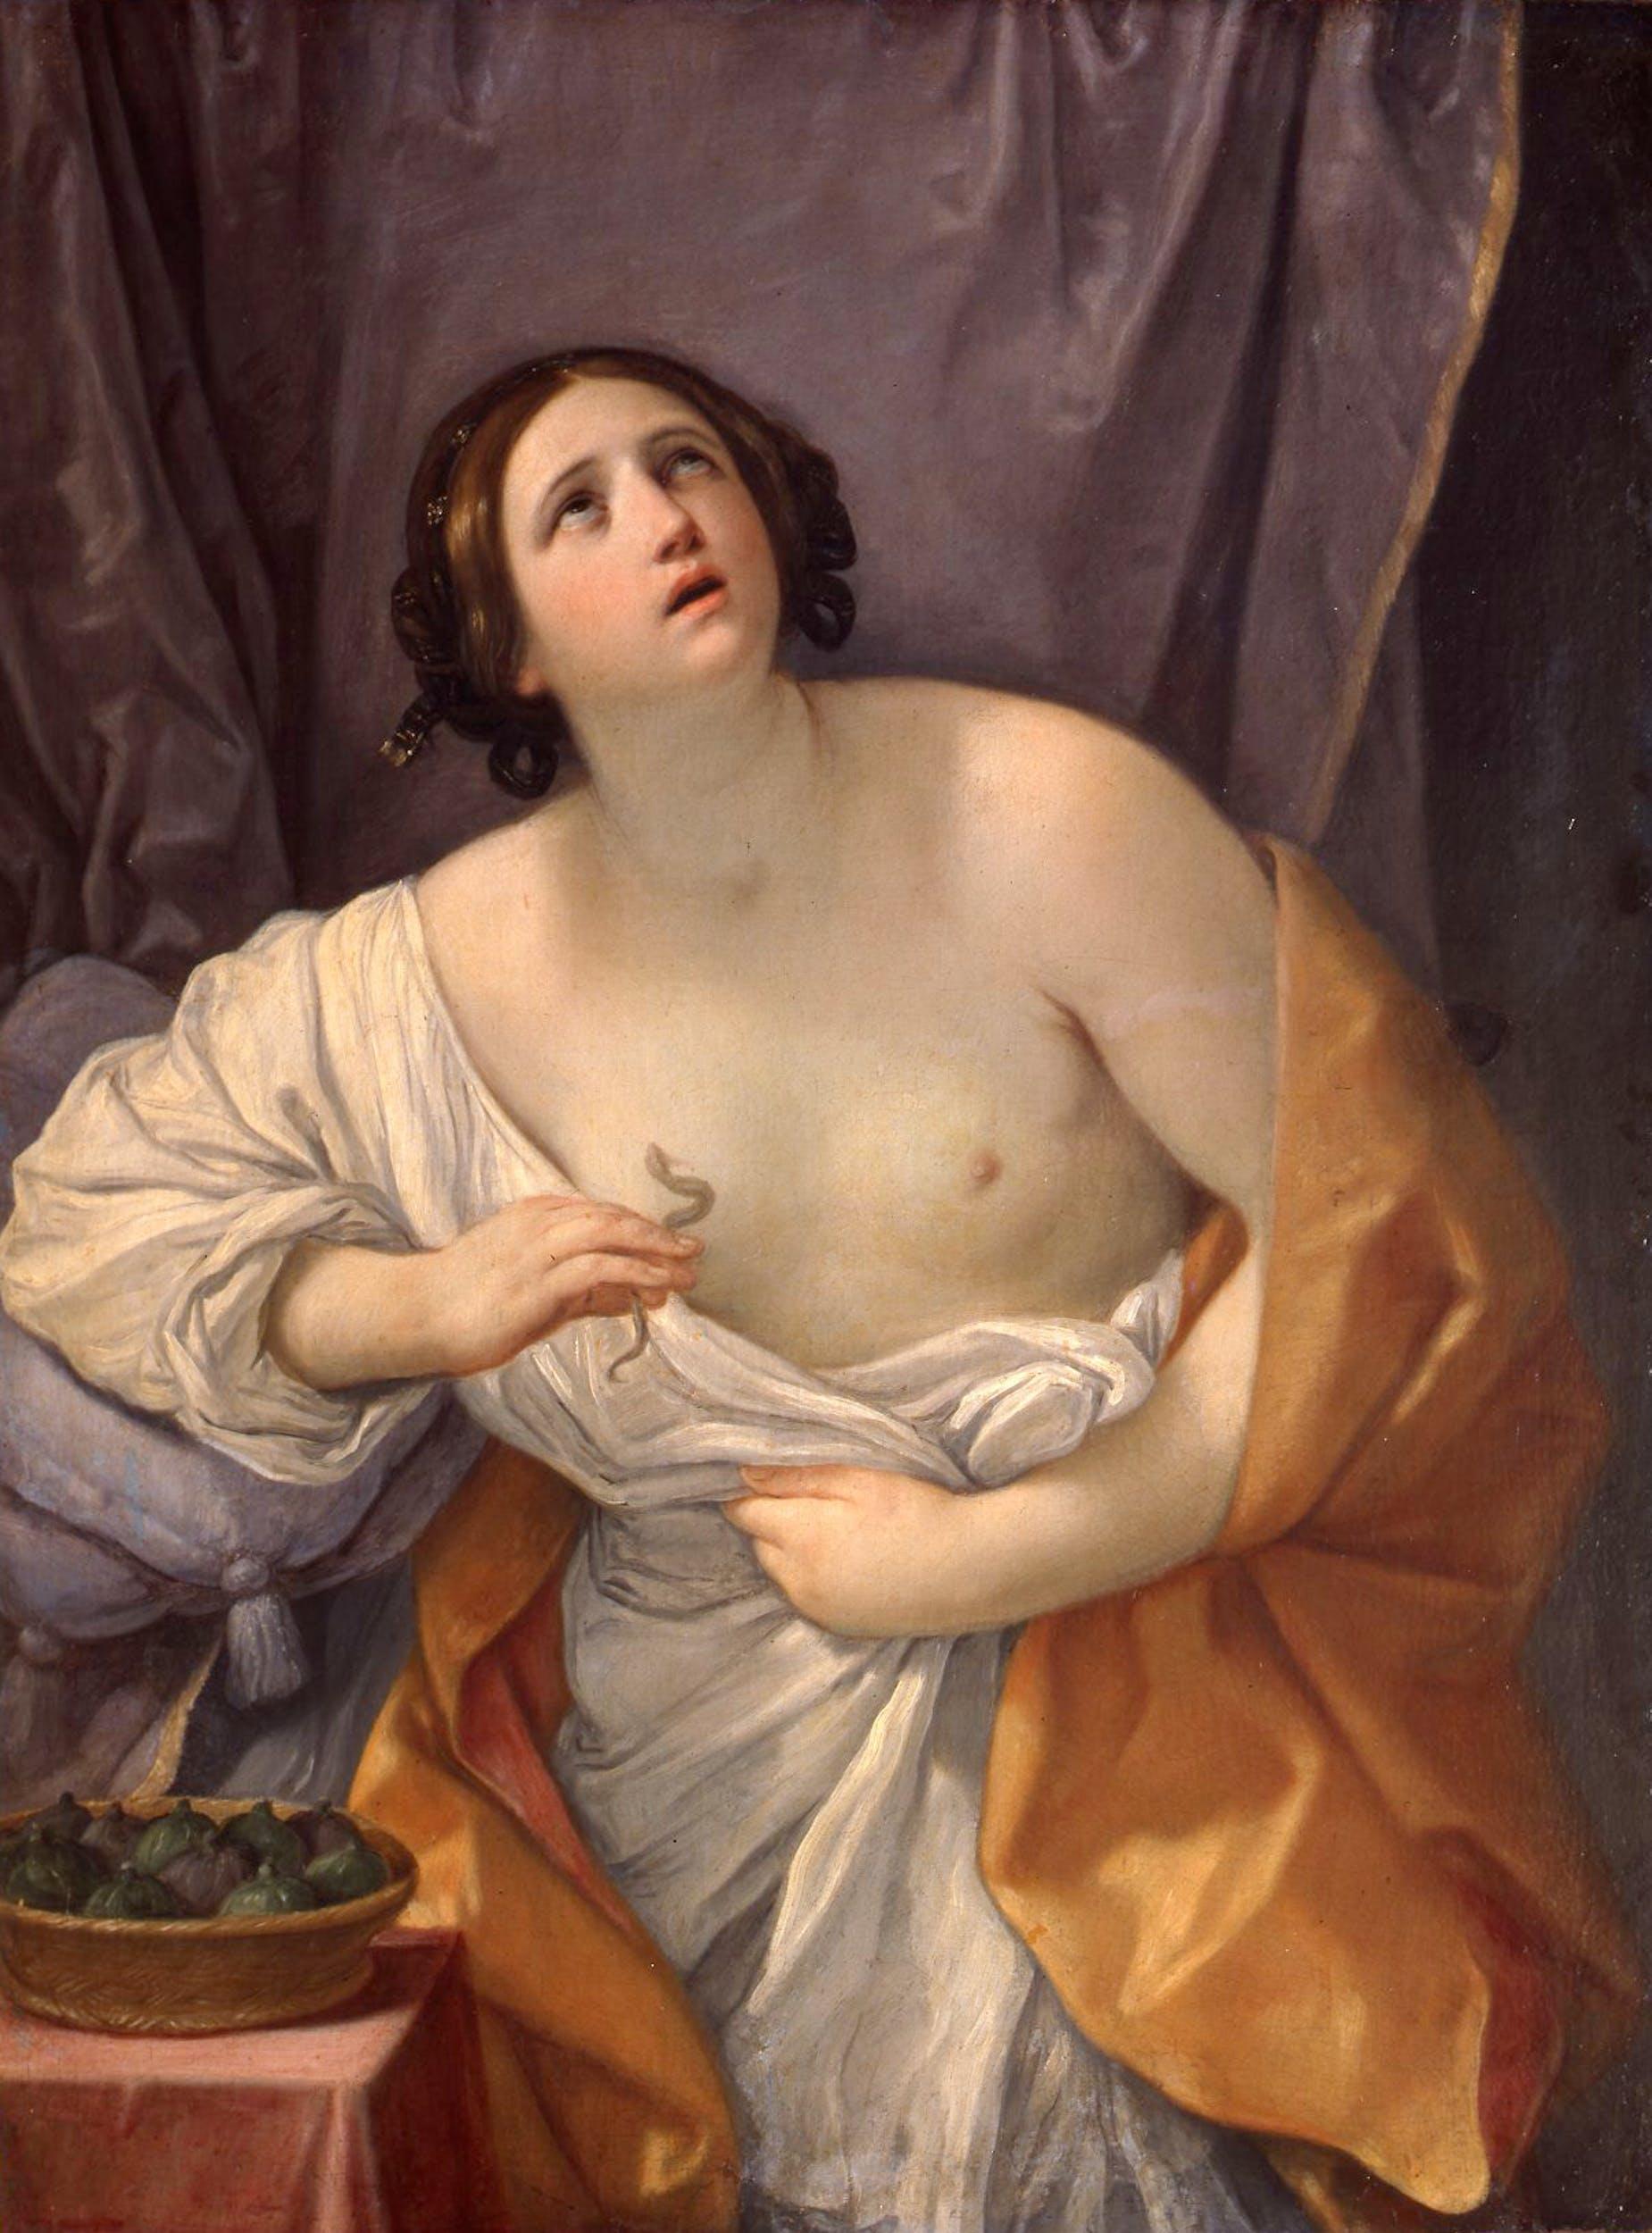 Guido Reni, Cleopatra, Galleria Palatina